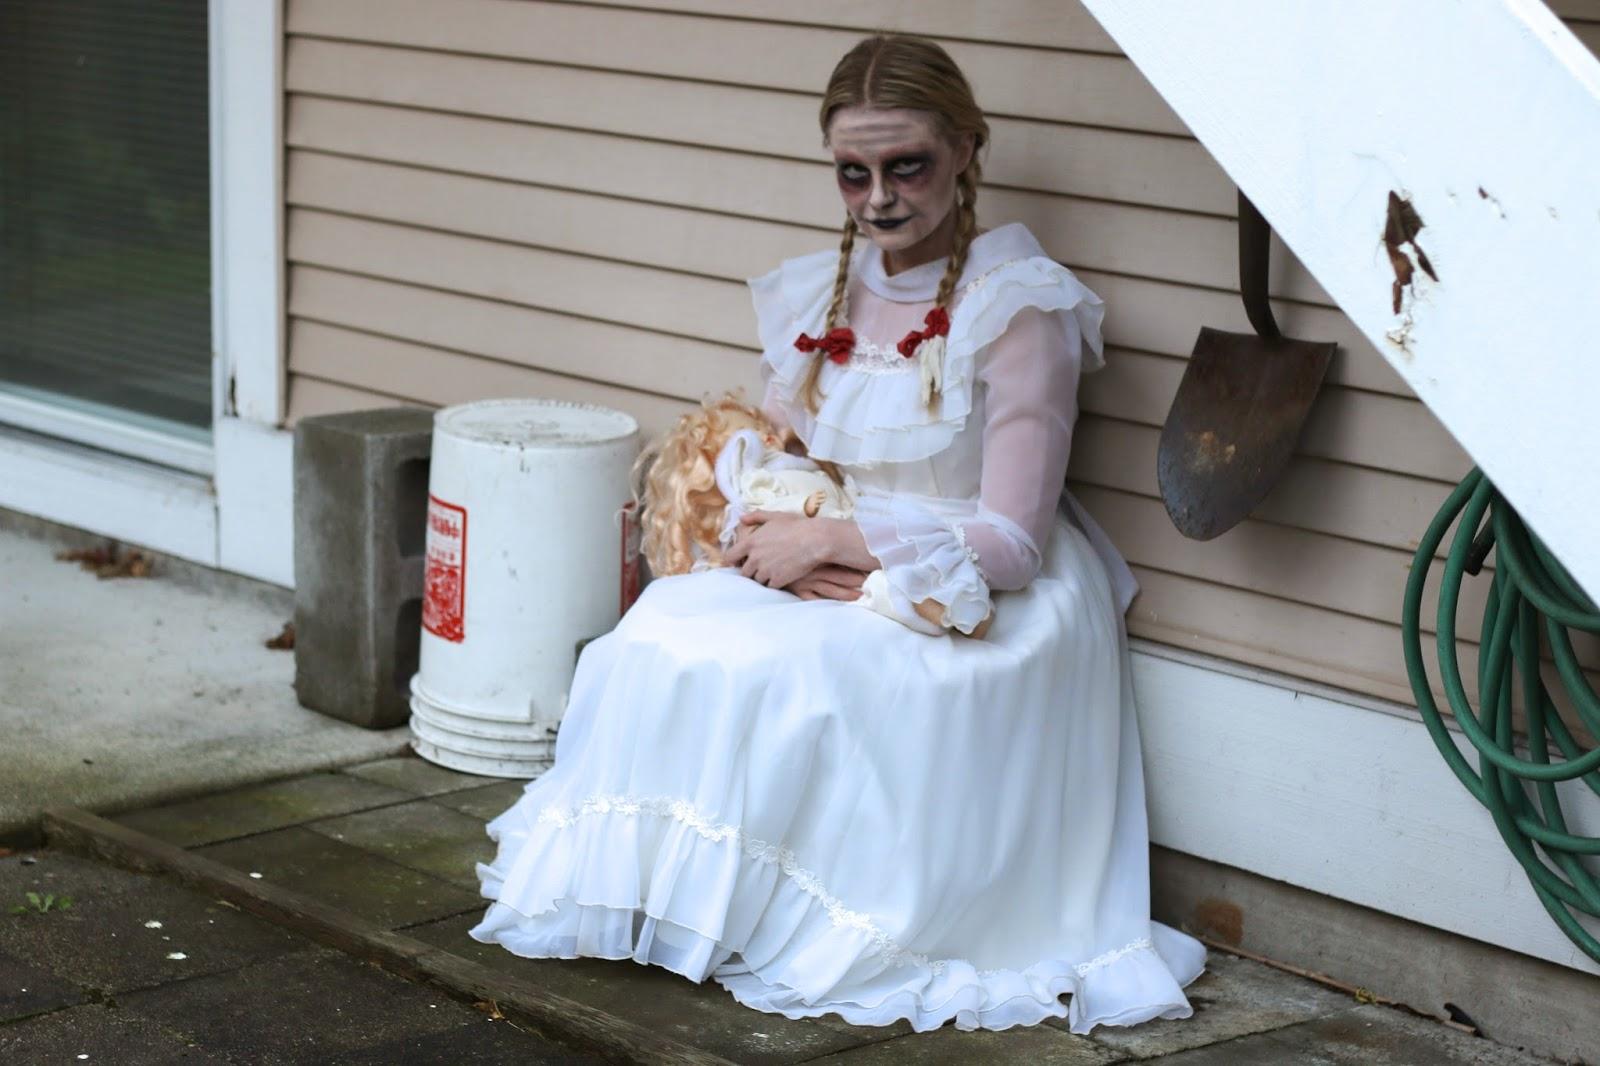 creepy little girl costume